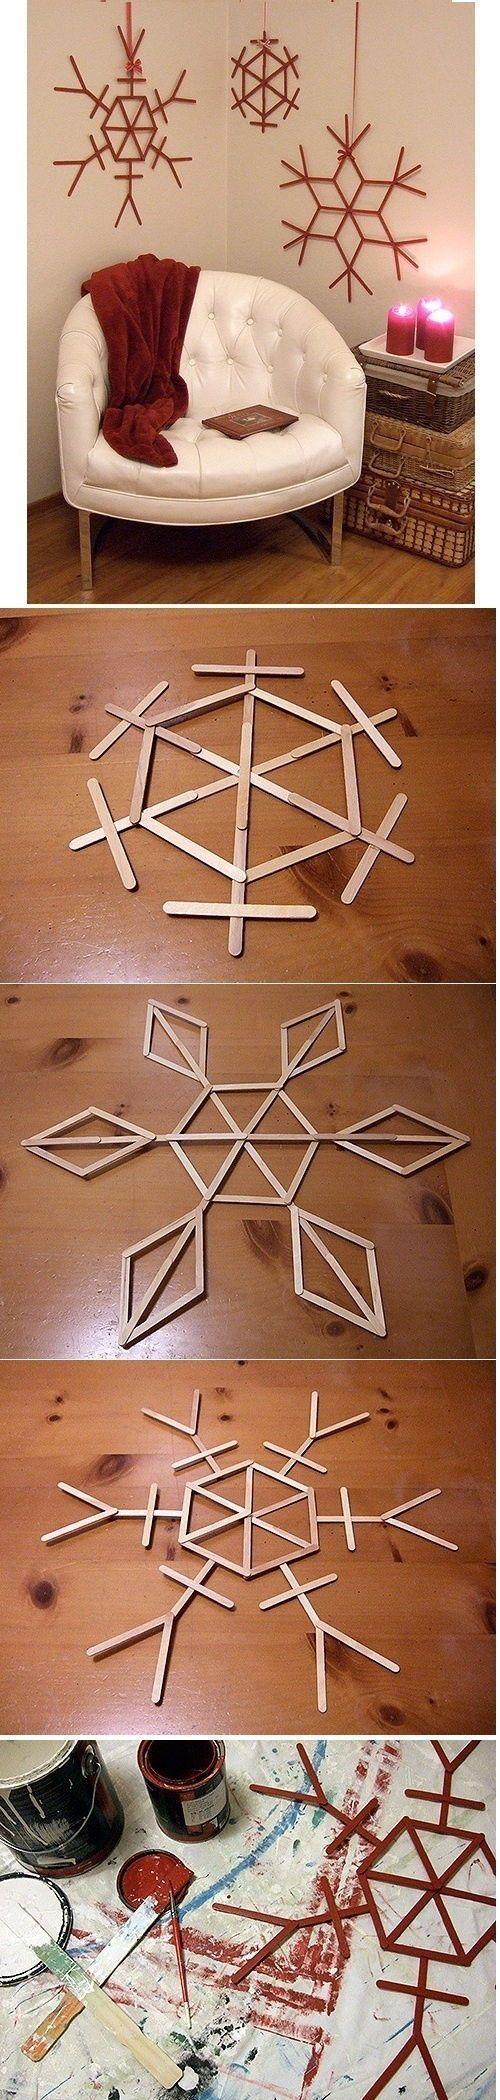 DIY Popsicle Stick Snowflakes